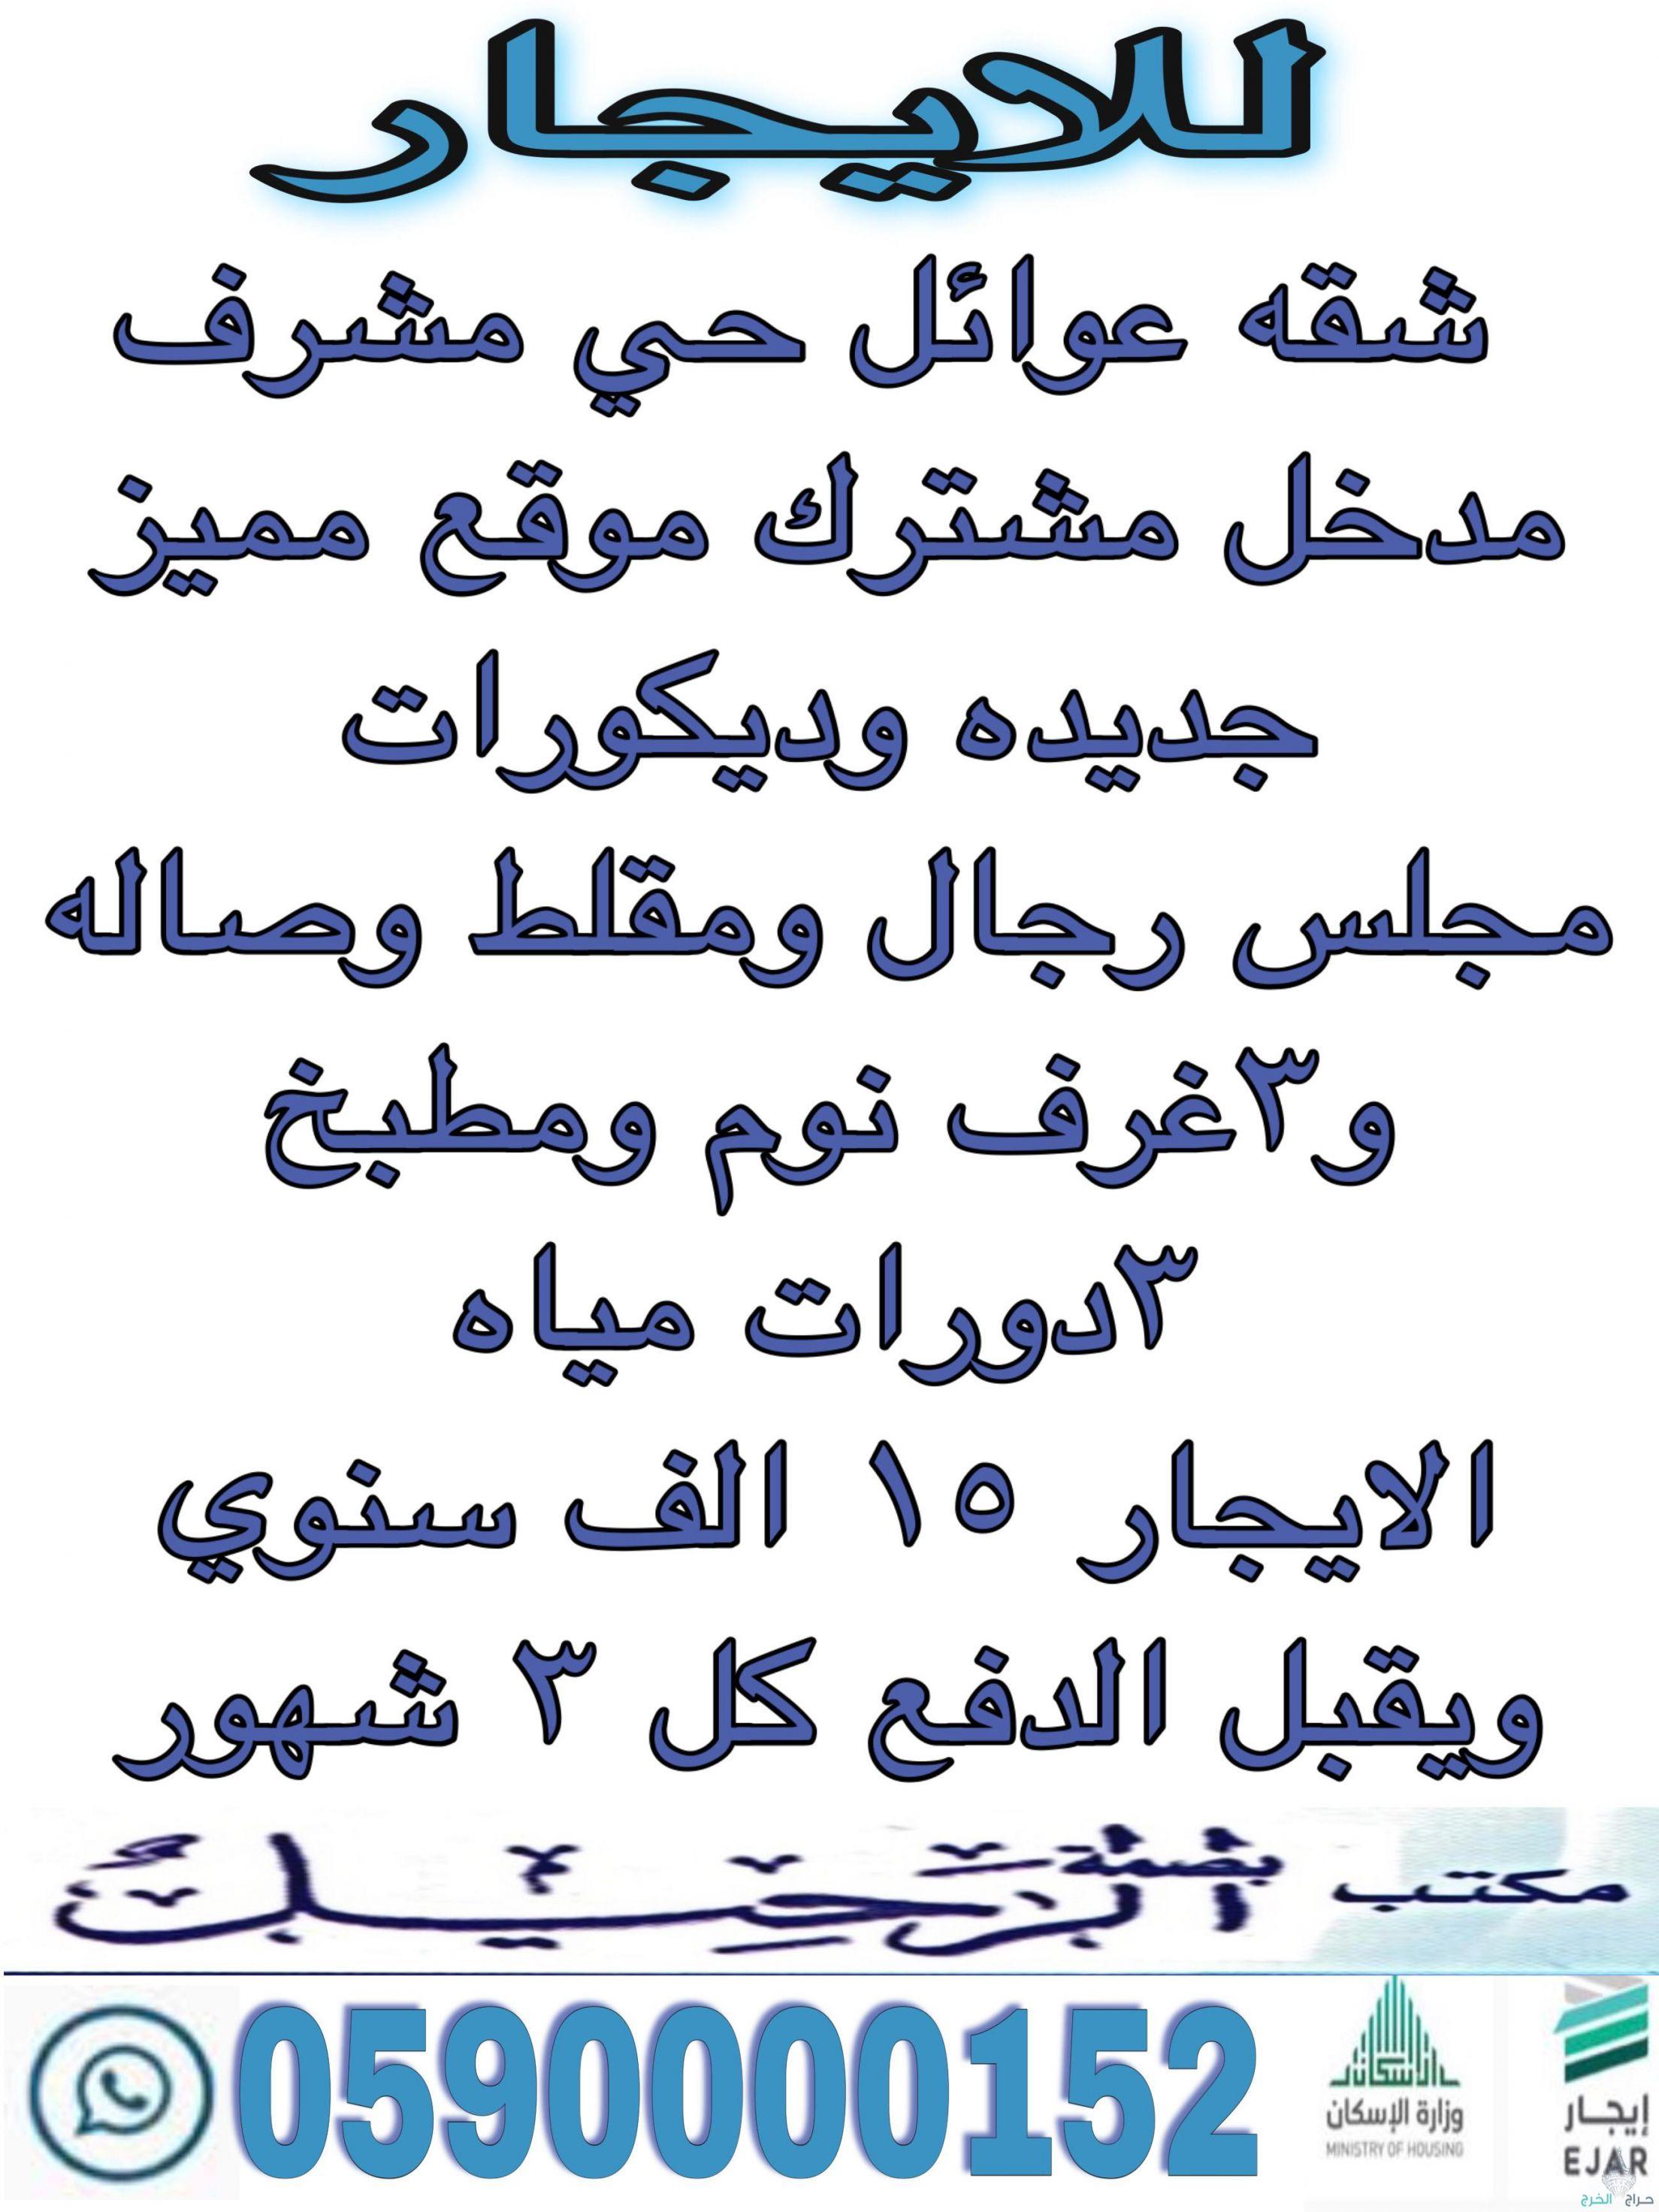 للايجار شقه عوائل جديده وديكورات حي مشرف